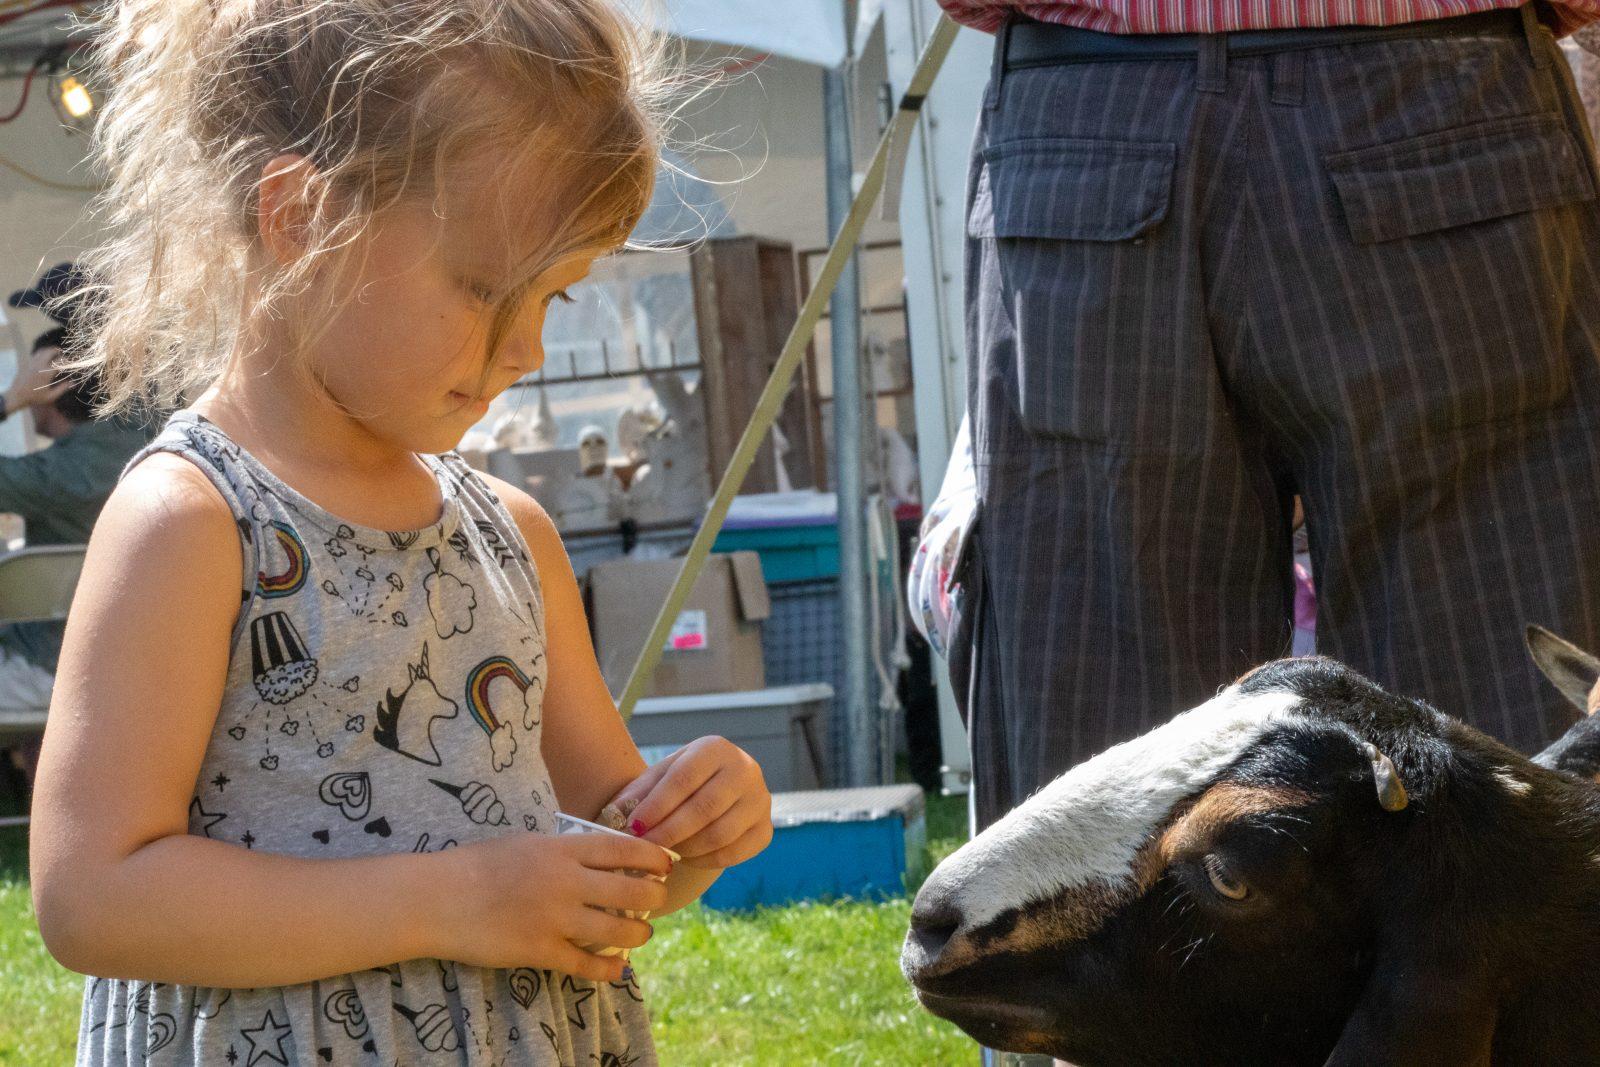 Williamstown Fair returns this September